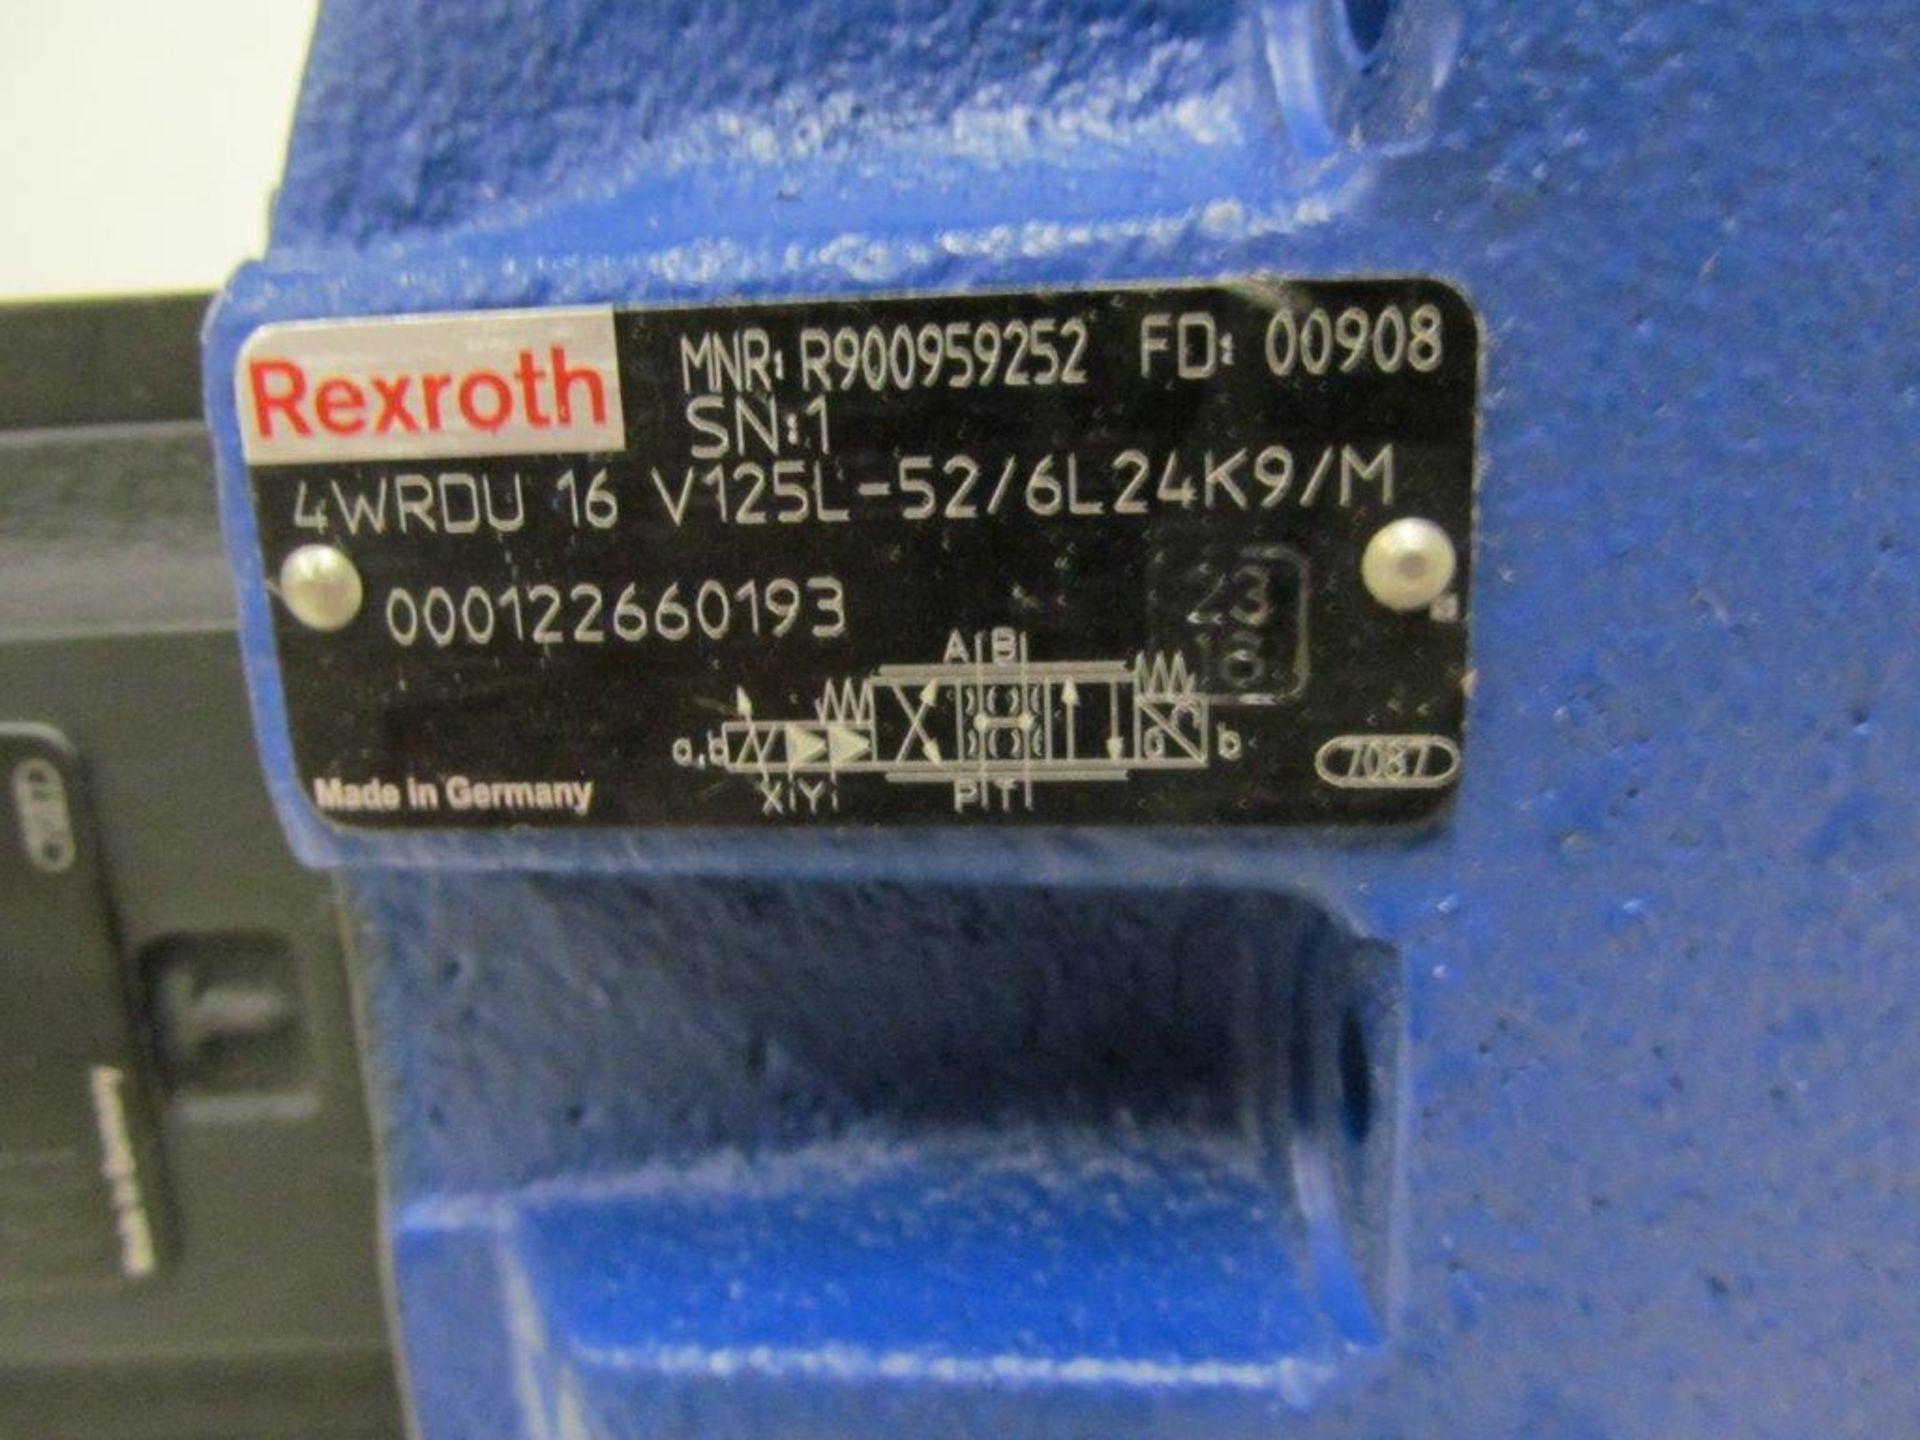 Lot 83 - (1) LOT (4) REXROTH CONTROL VALVES, MODEL 4WRDV, 24V NG16 (3) NEW & (1) USED